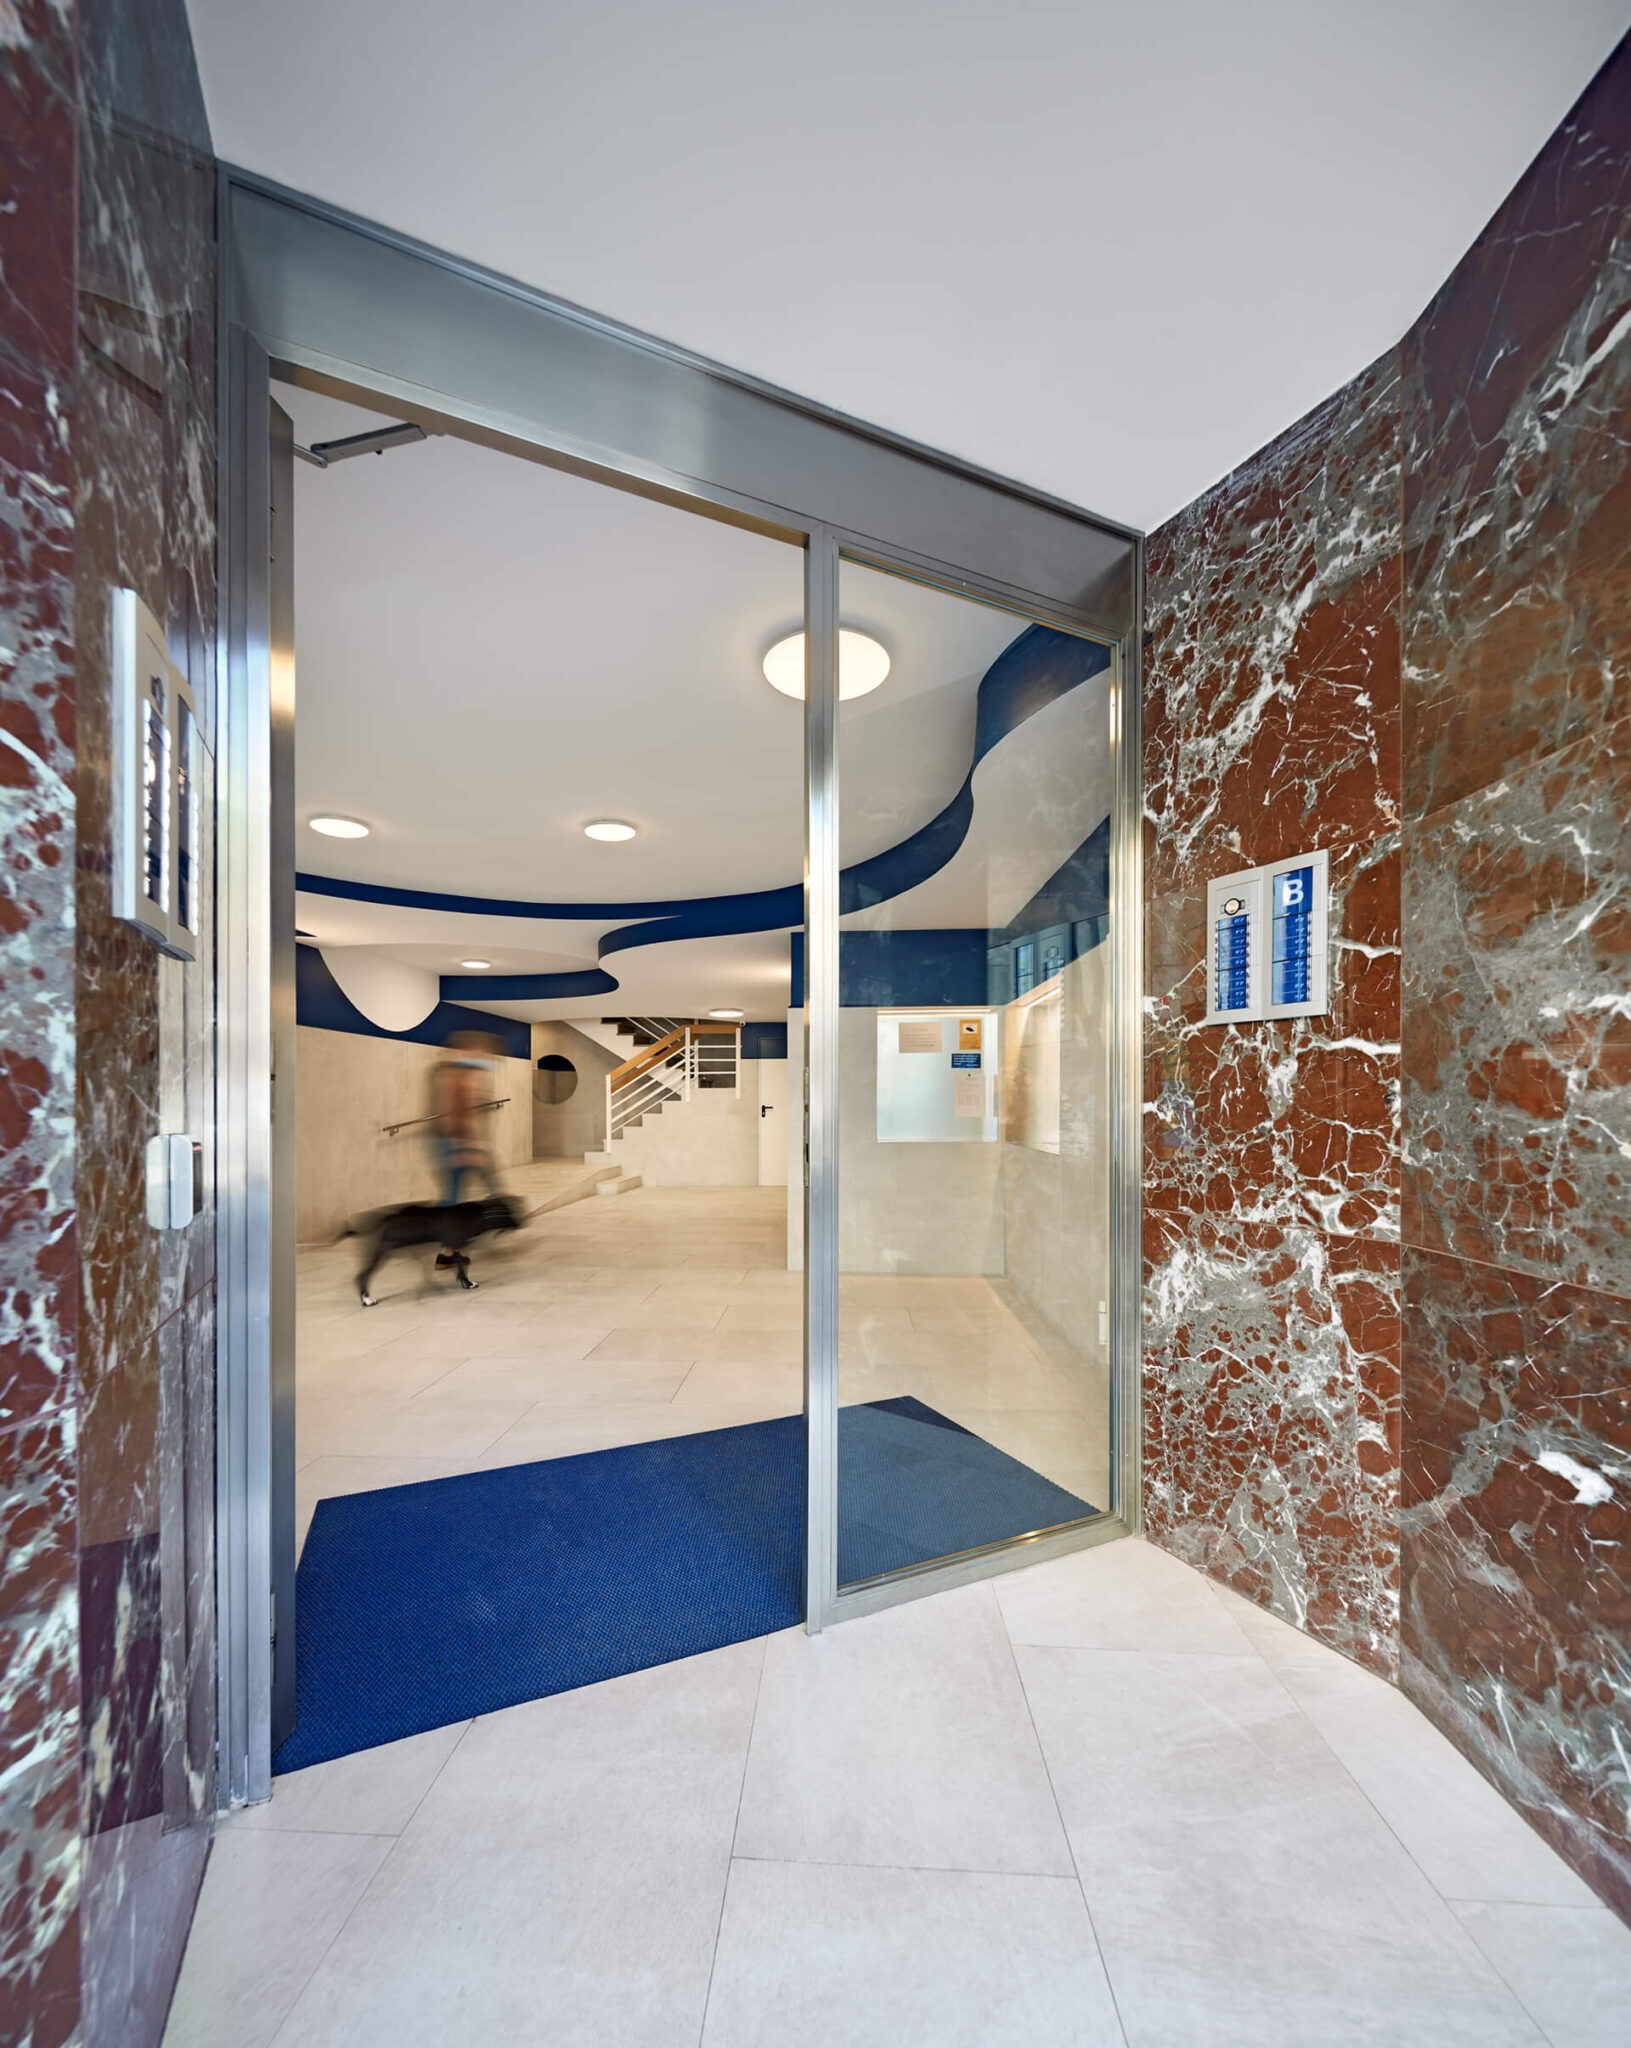 Pintor Pahissa Residential Entrance Lobby Refurbishment by Miel Arquitectos.